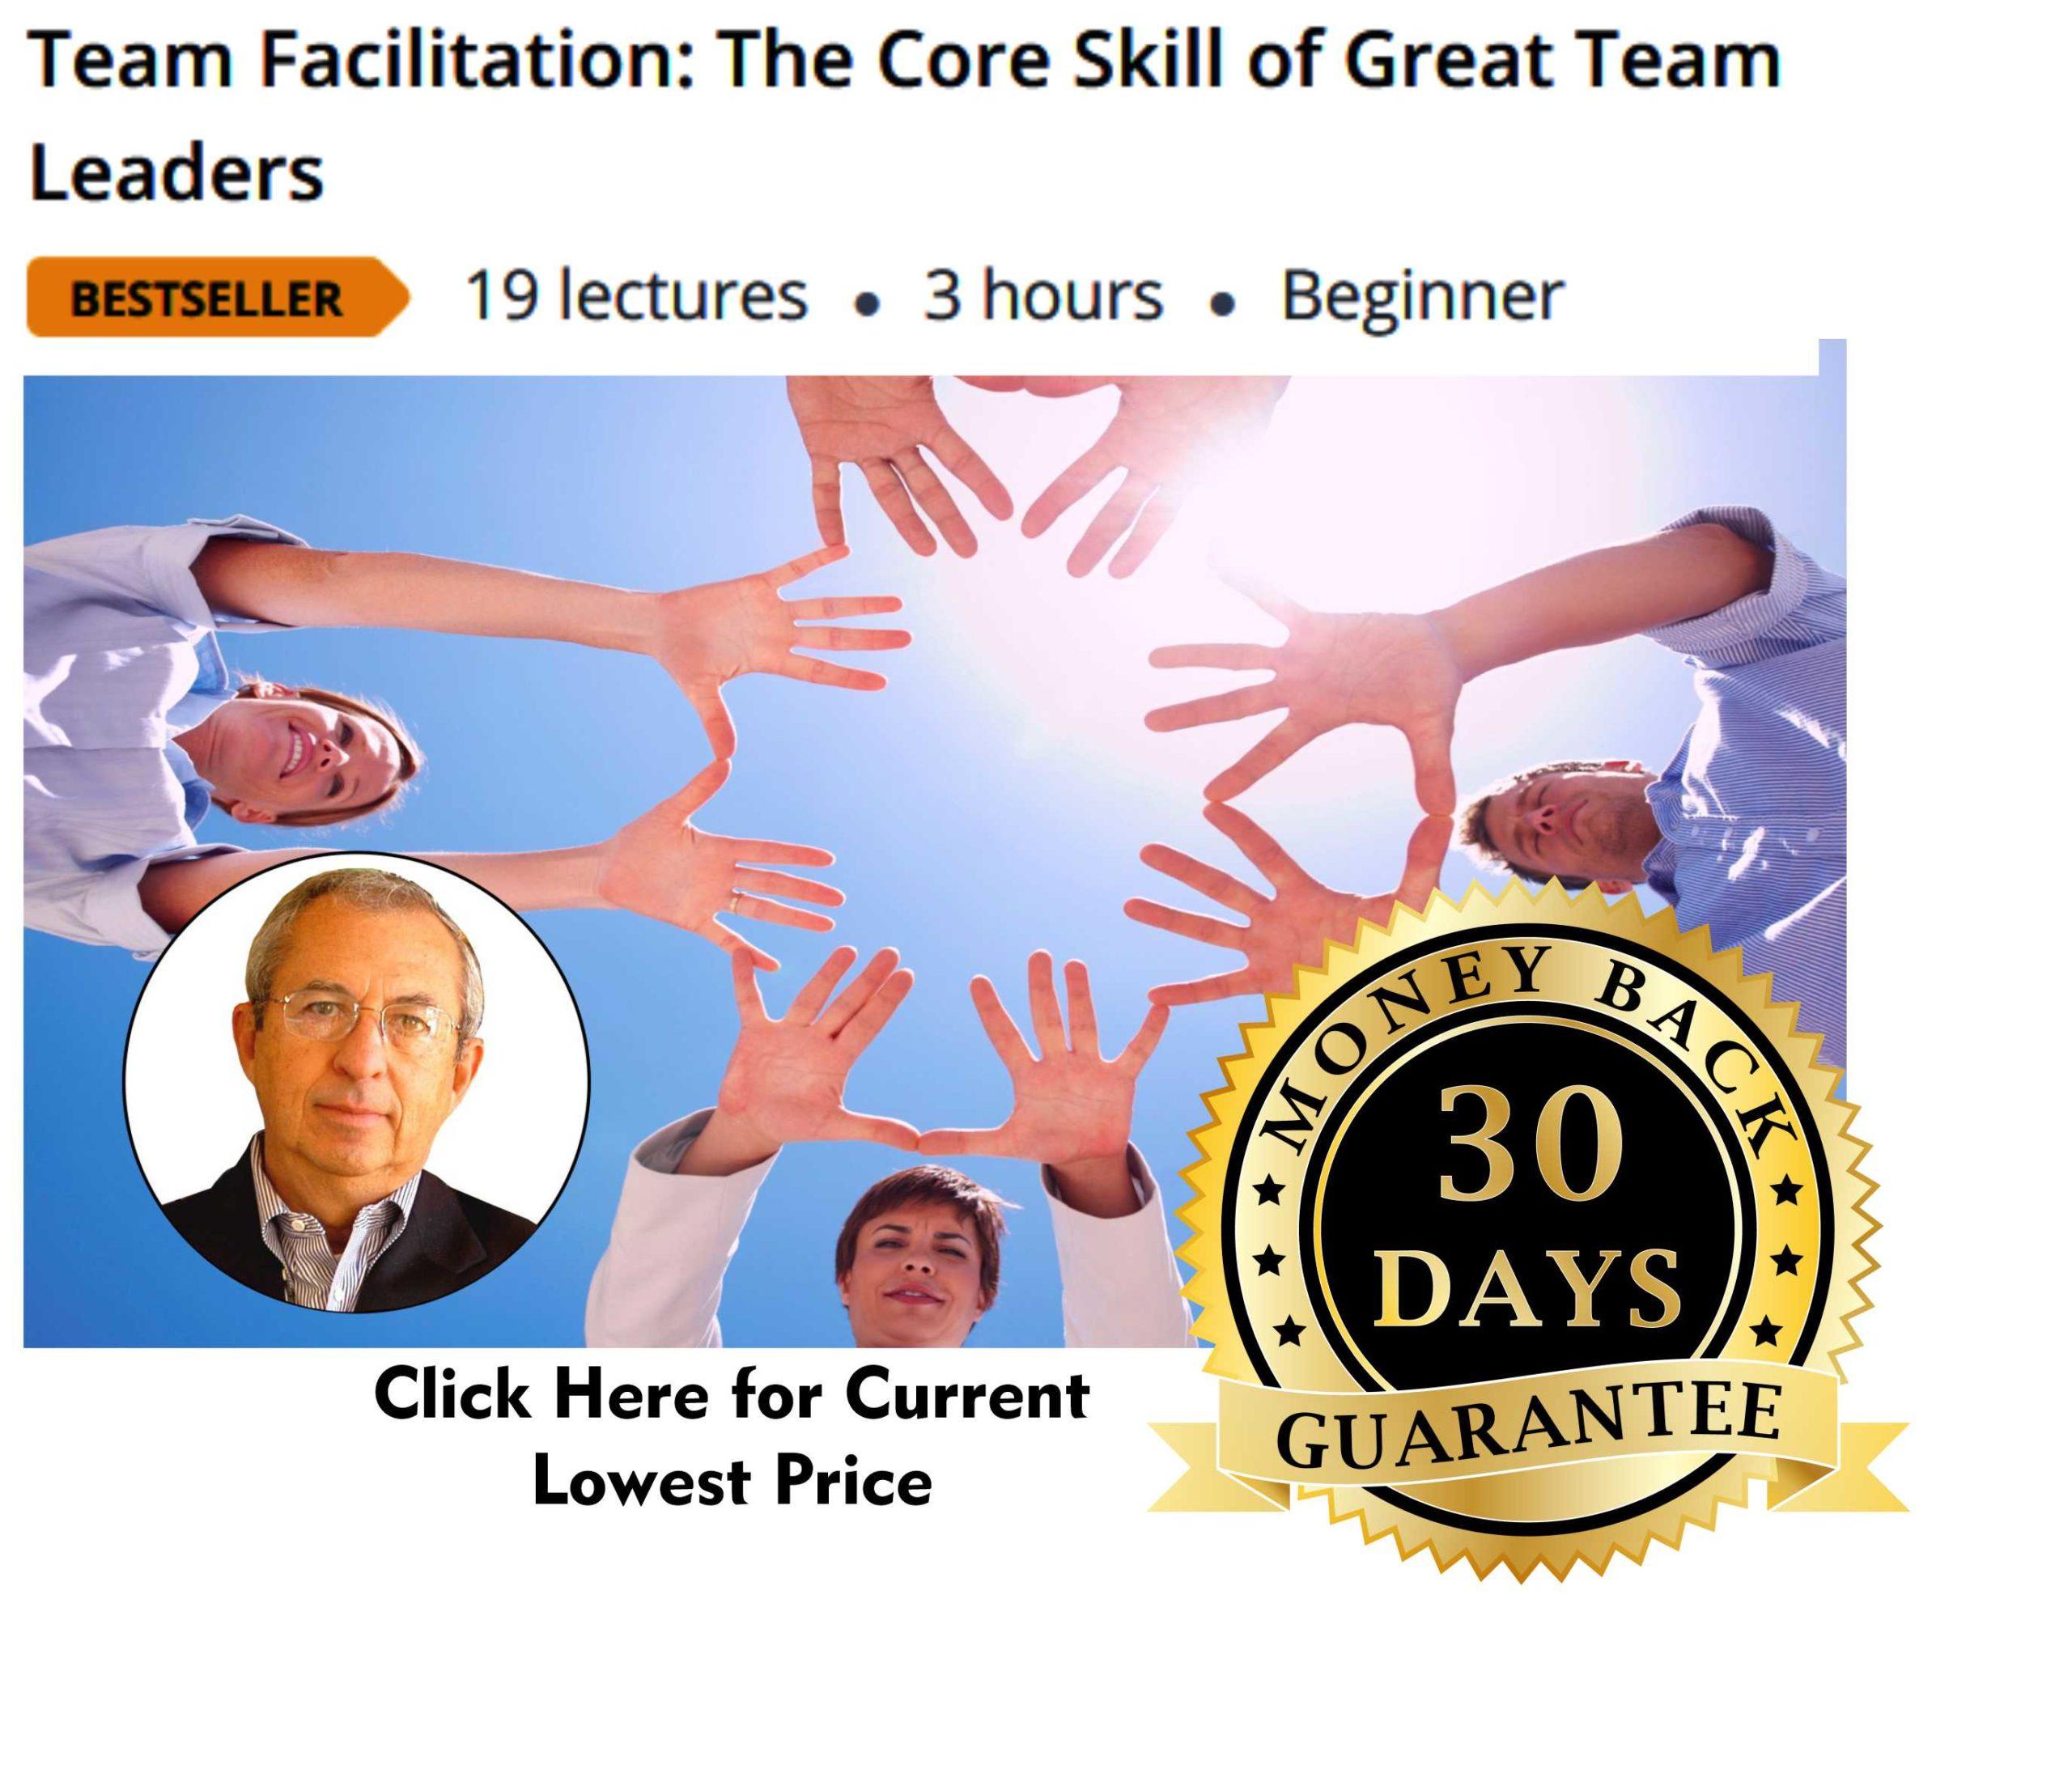 Team Facilitation Skills